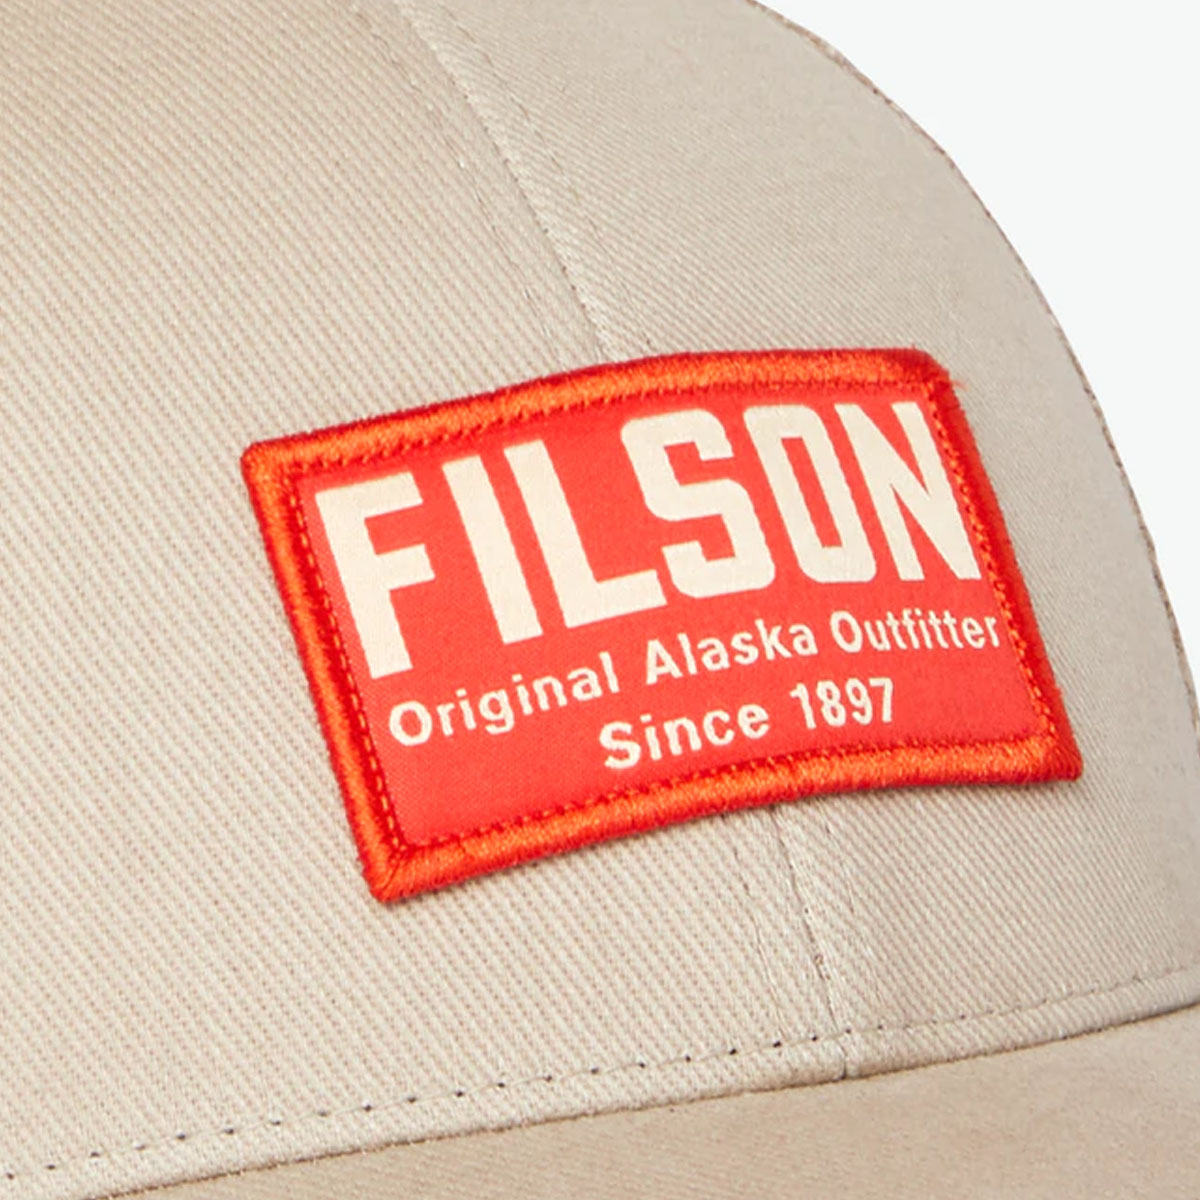 Filson Mesh Snap-Back Logger Cap 20204520-Khaki, slijtvaste pet met geborduurd Filson logo patch en mesh-zoonbescherming